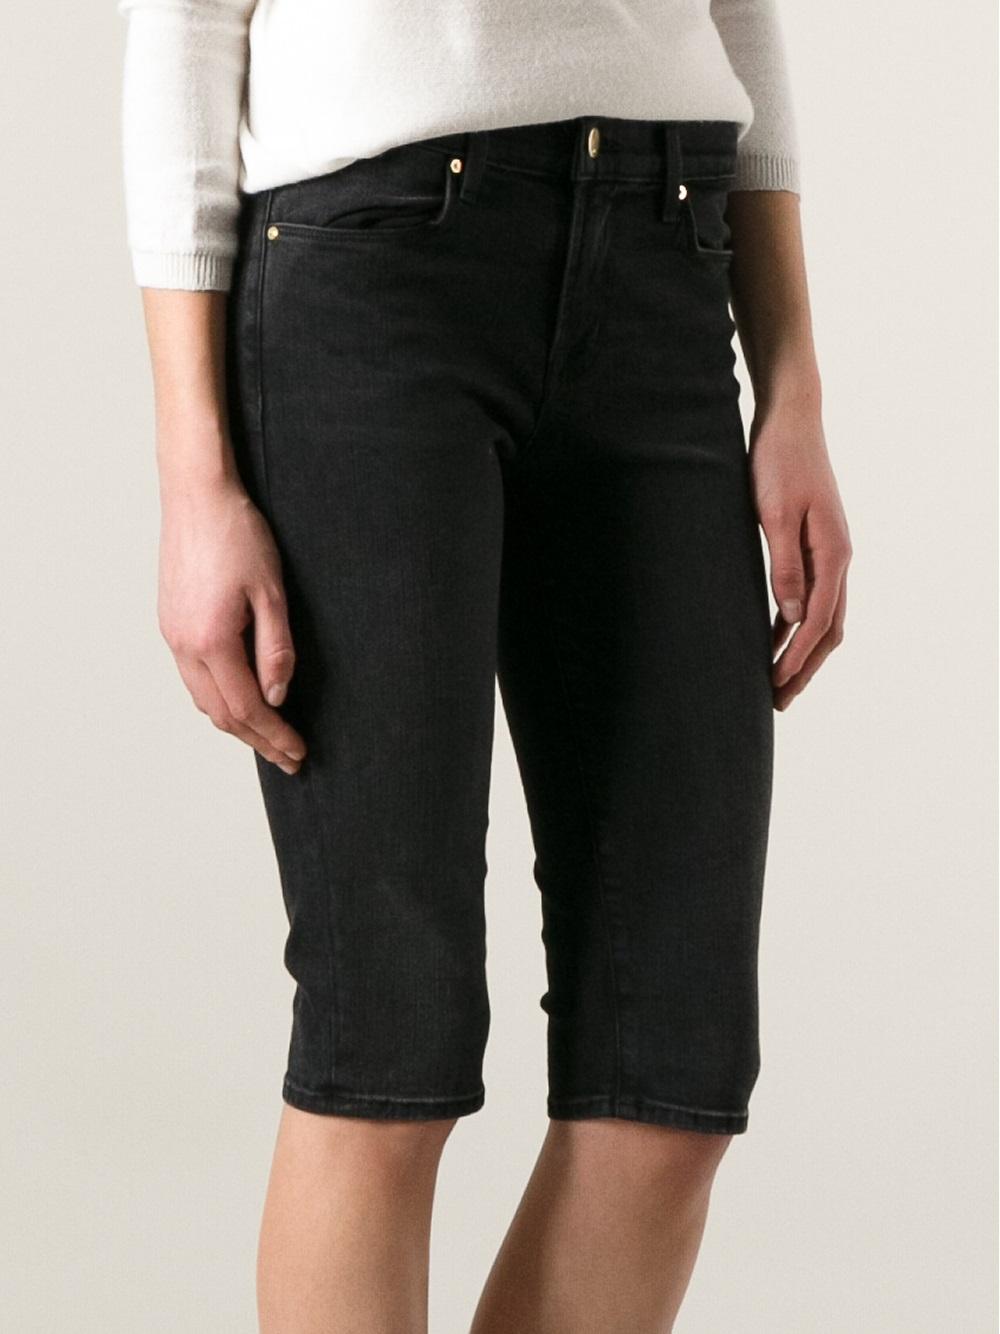 Black Denim Knee Length Shorts - Hardon Clothes